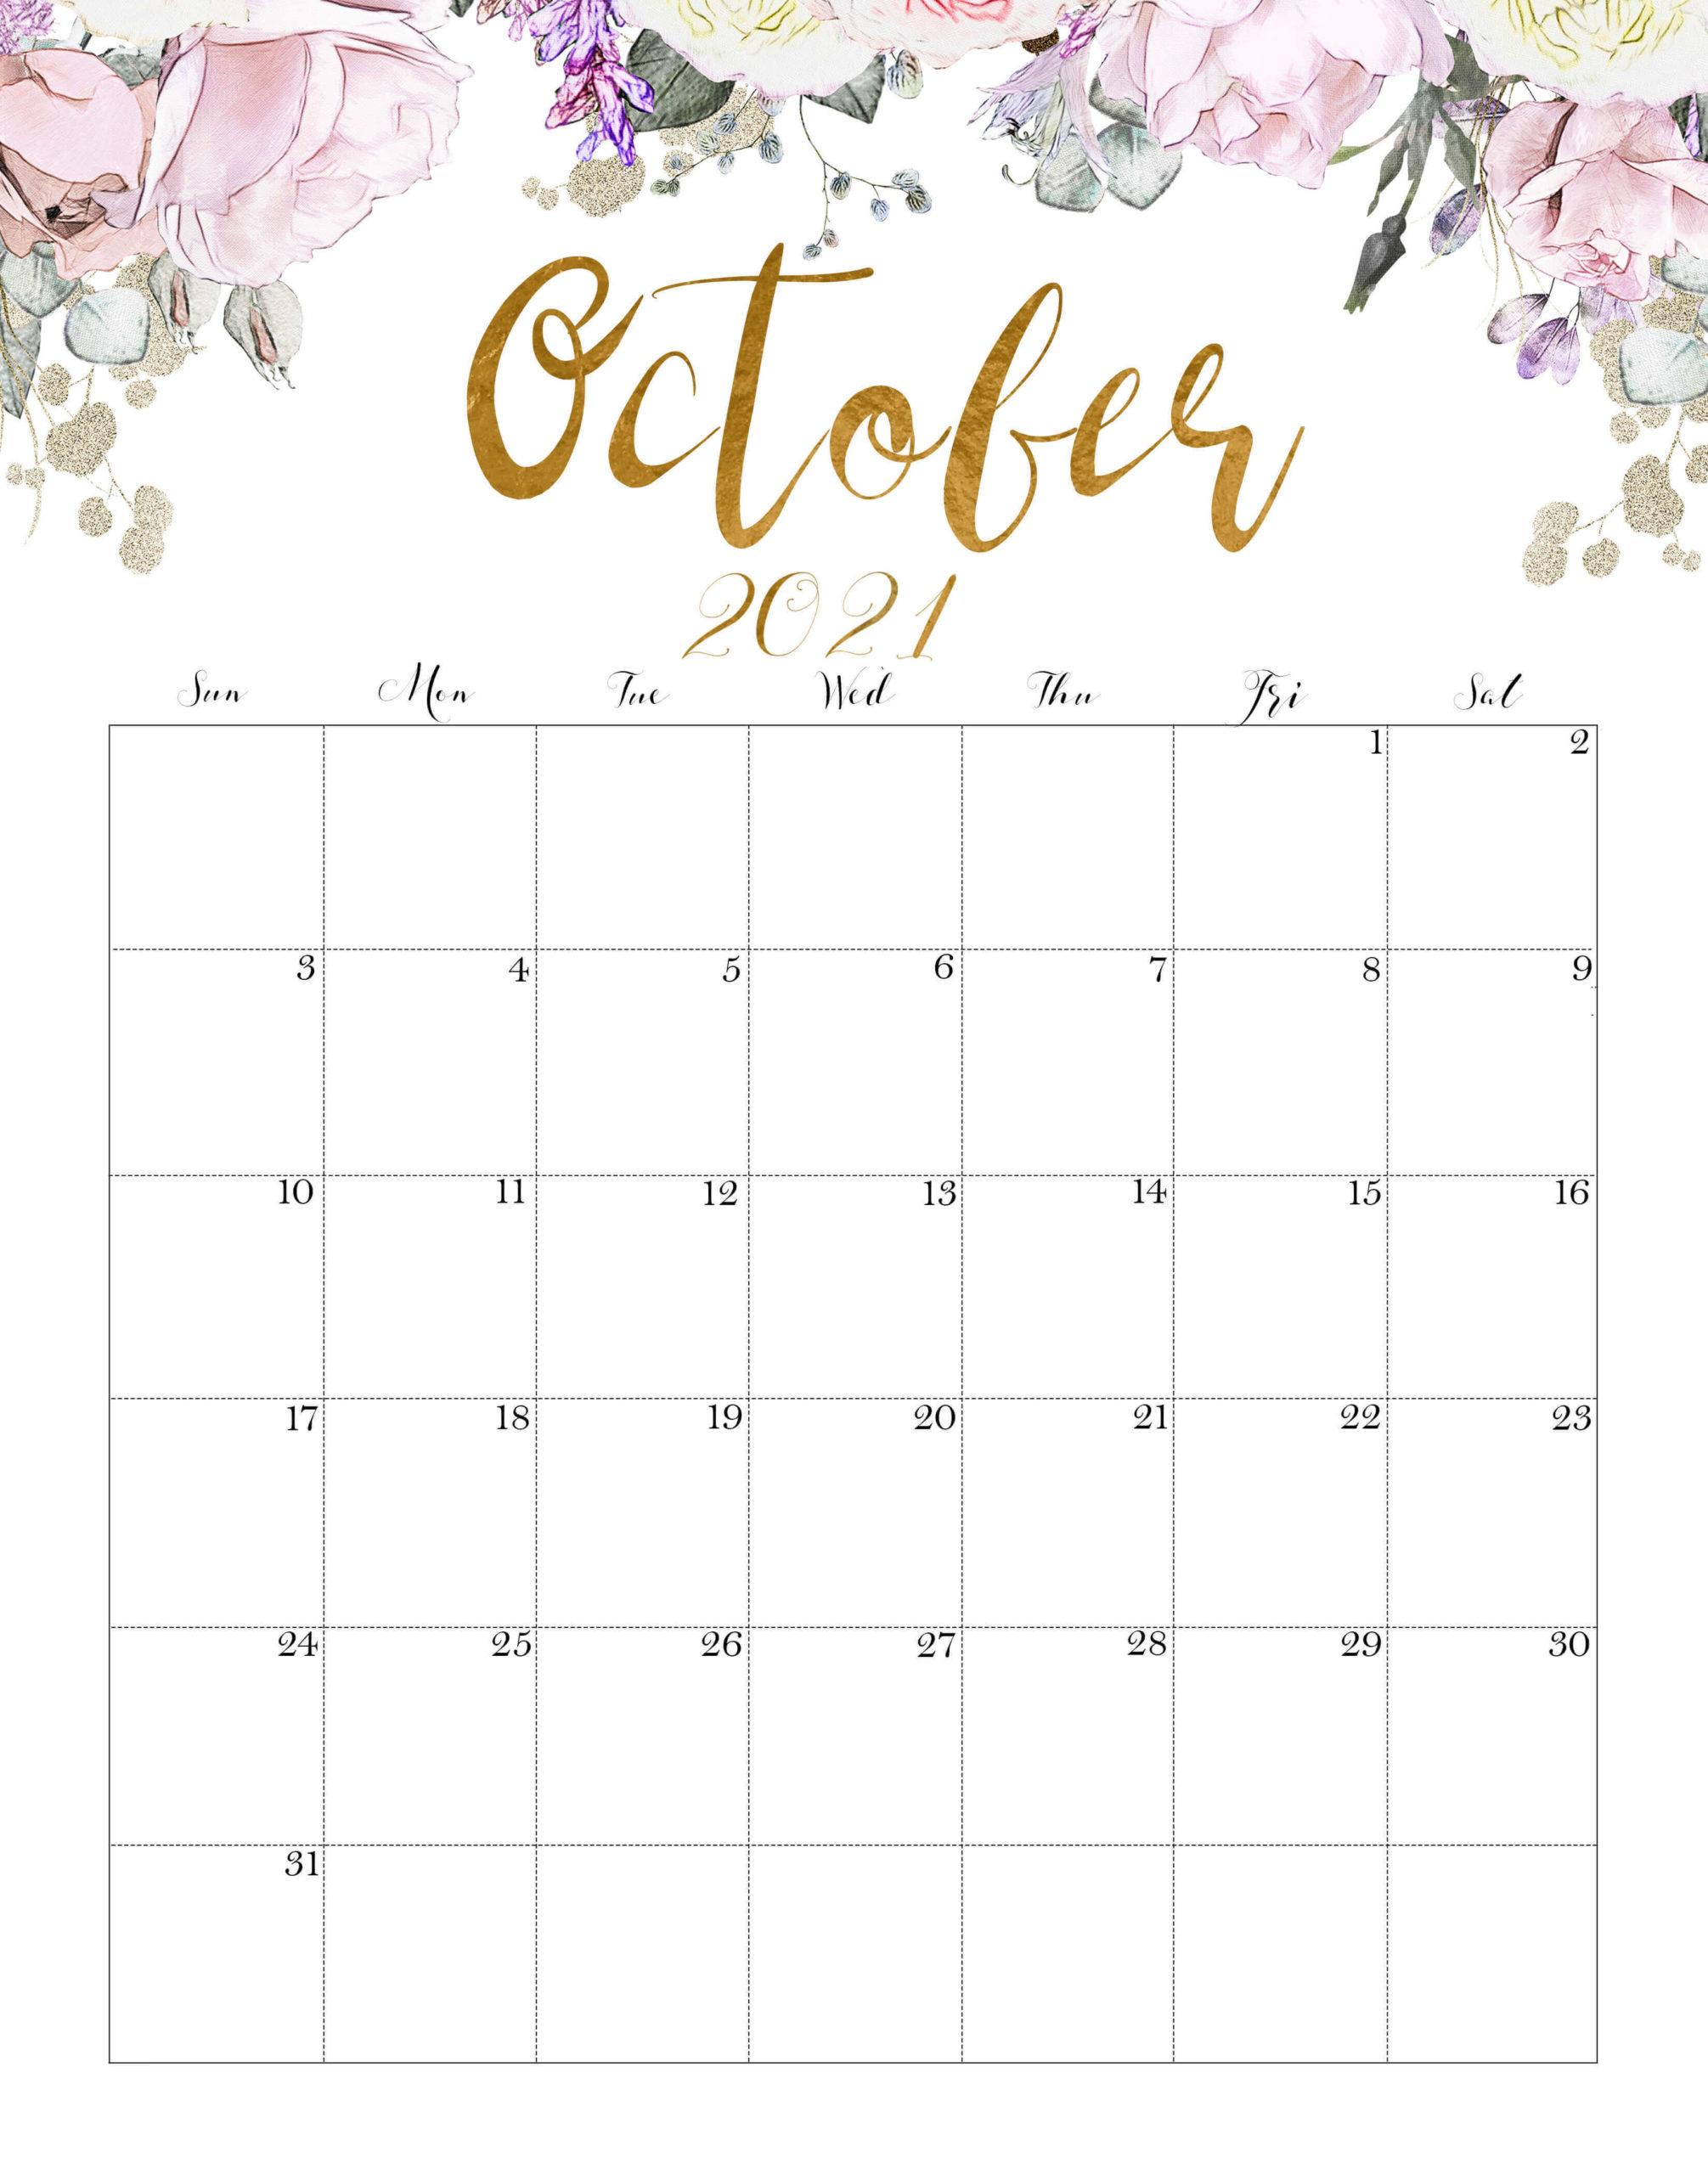 Cute October 2021 Calendar Floral